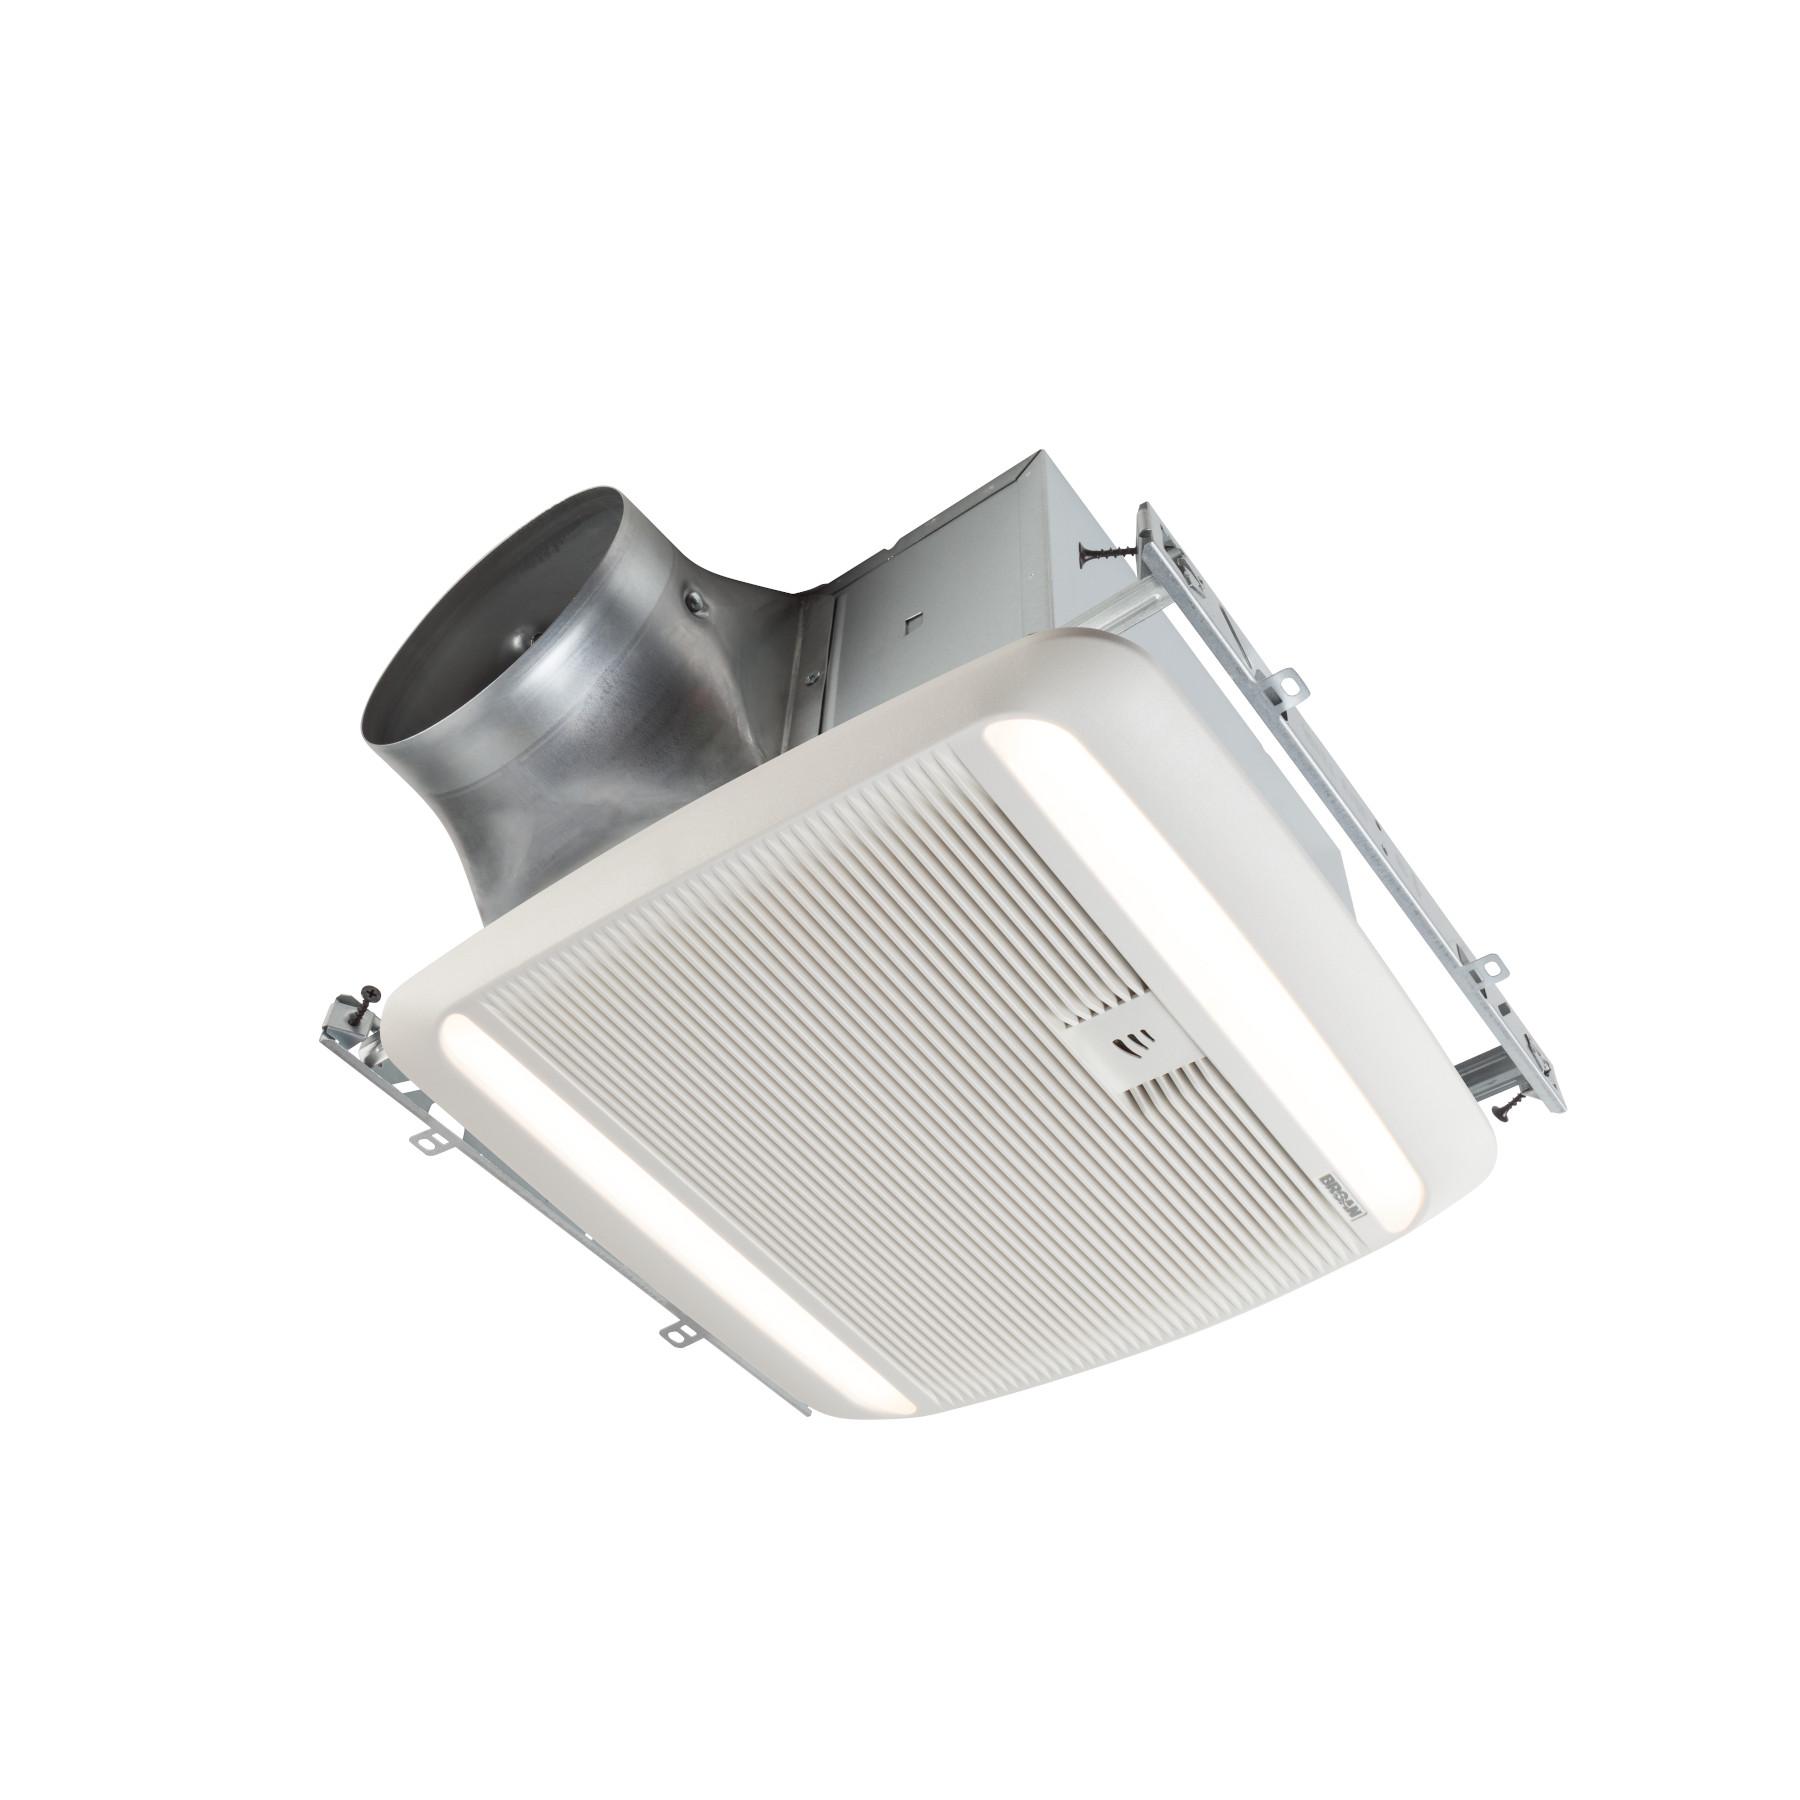 Humidity Motion Sensing Fans